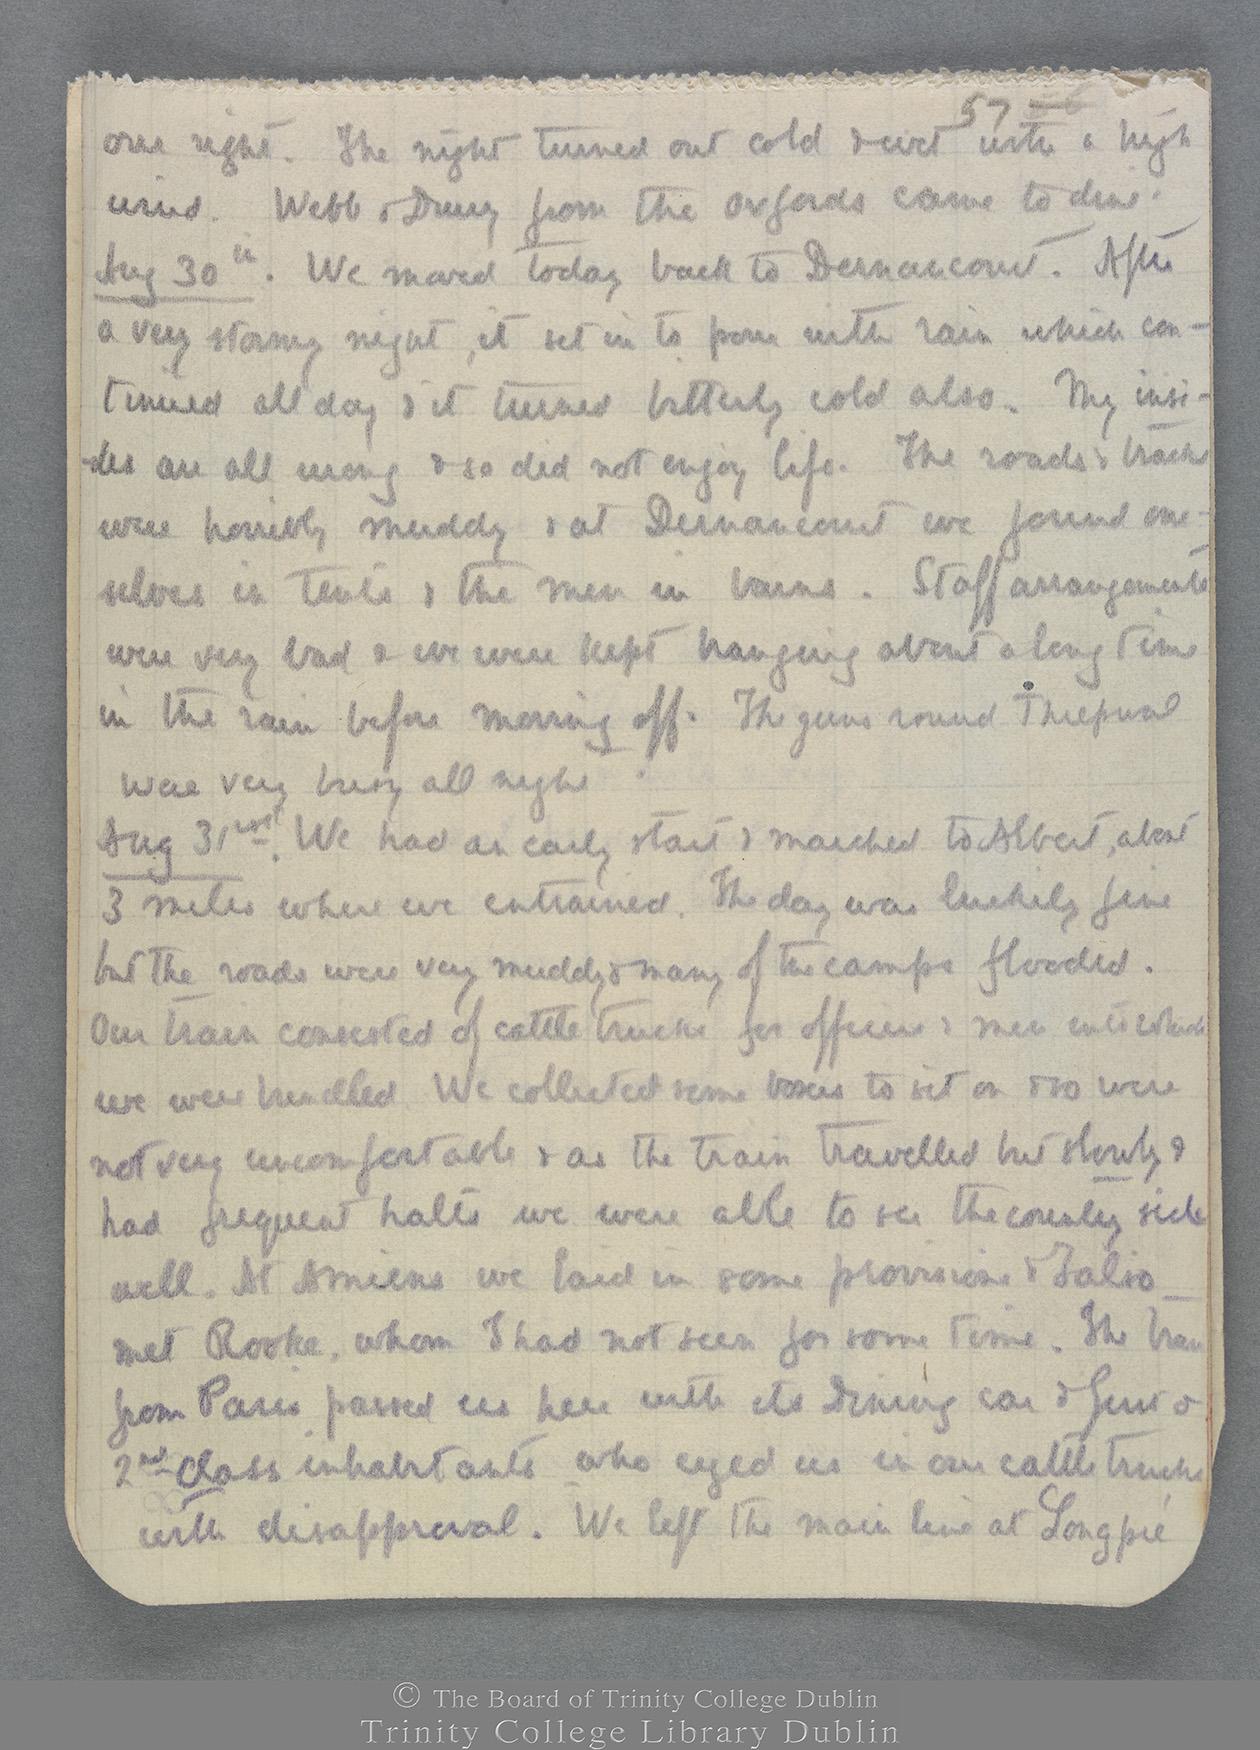 TCD MS 10821 folio 57 recto